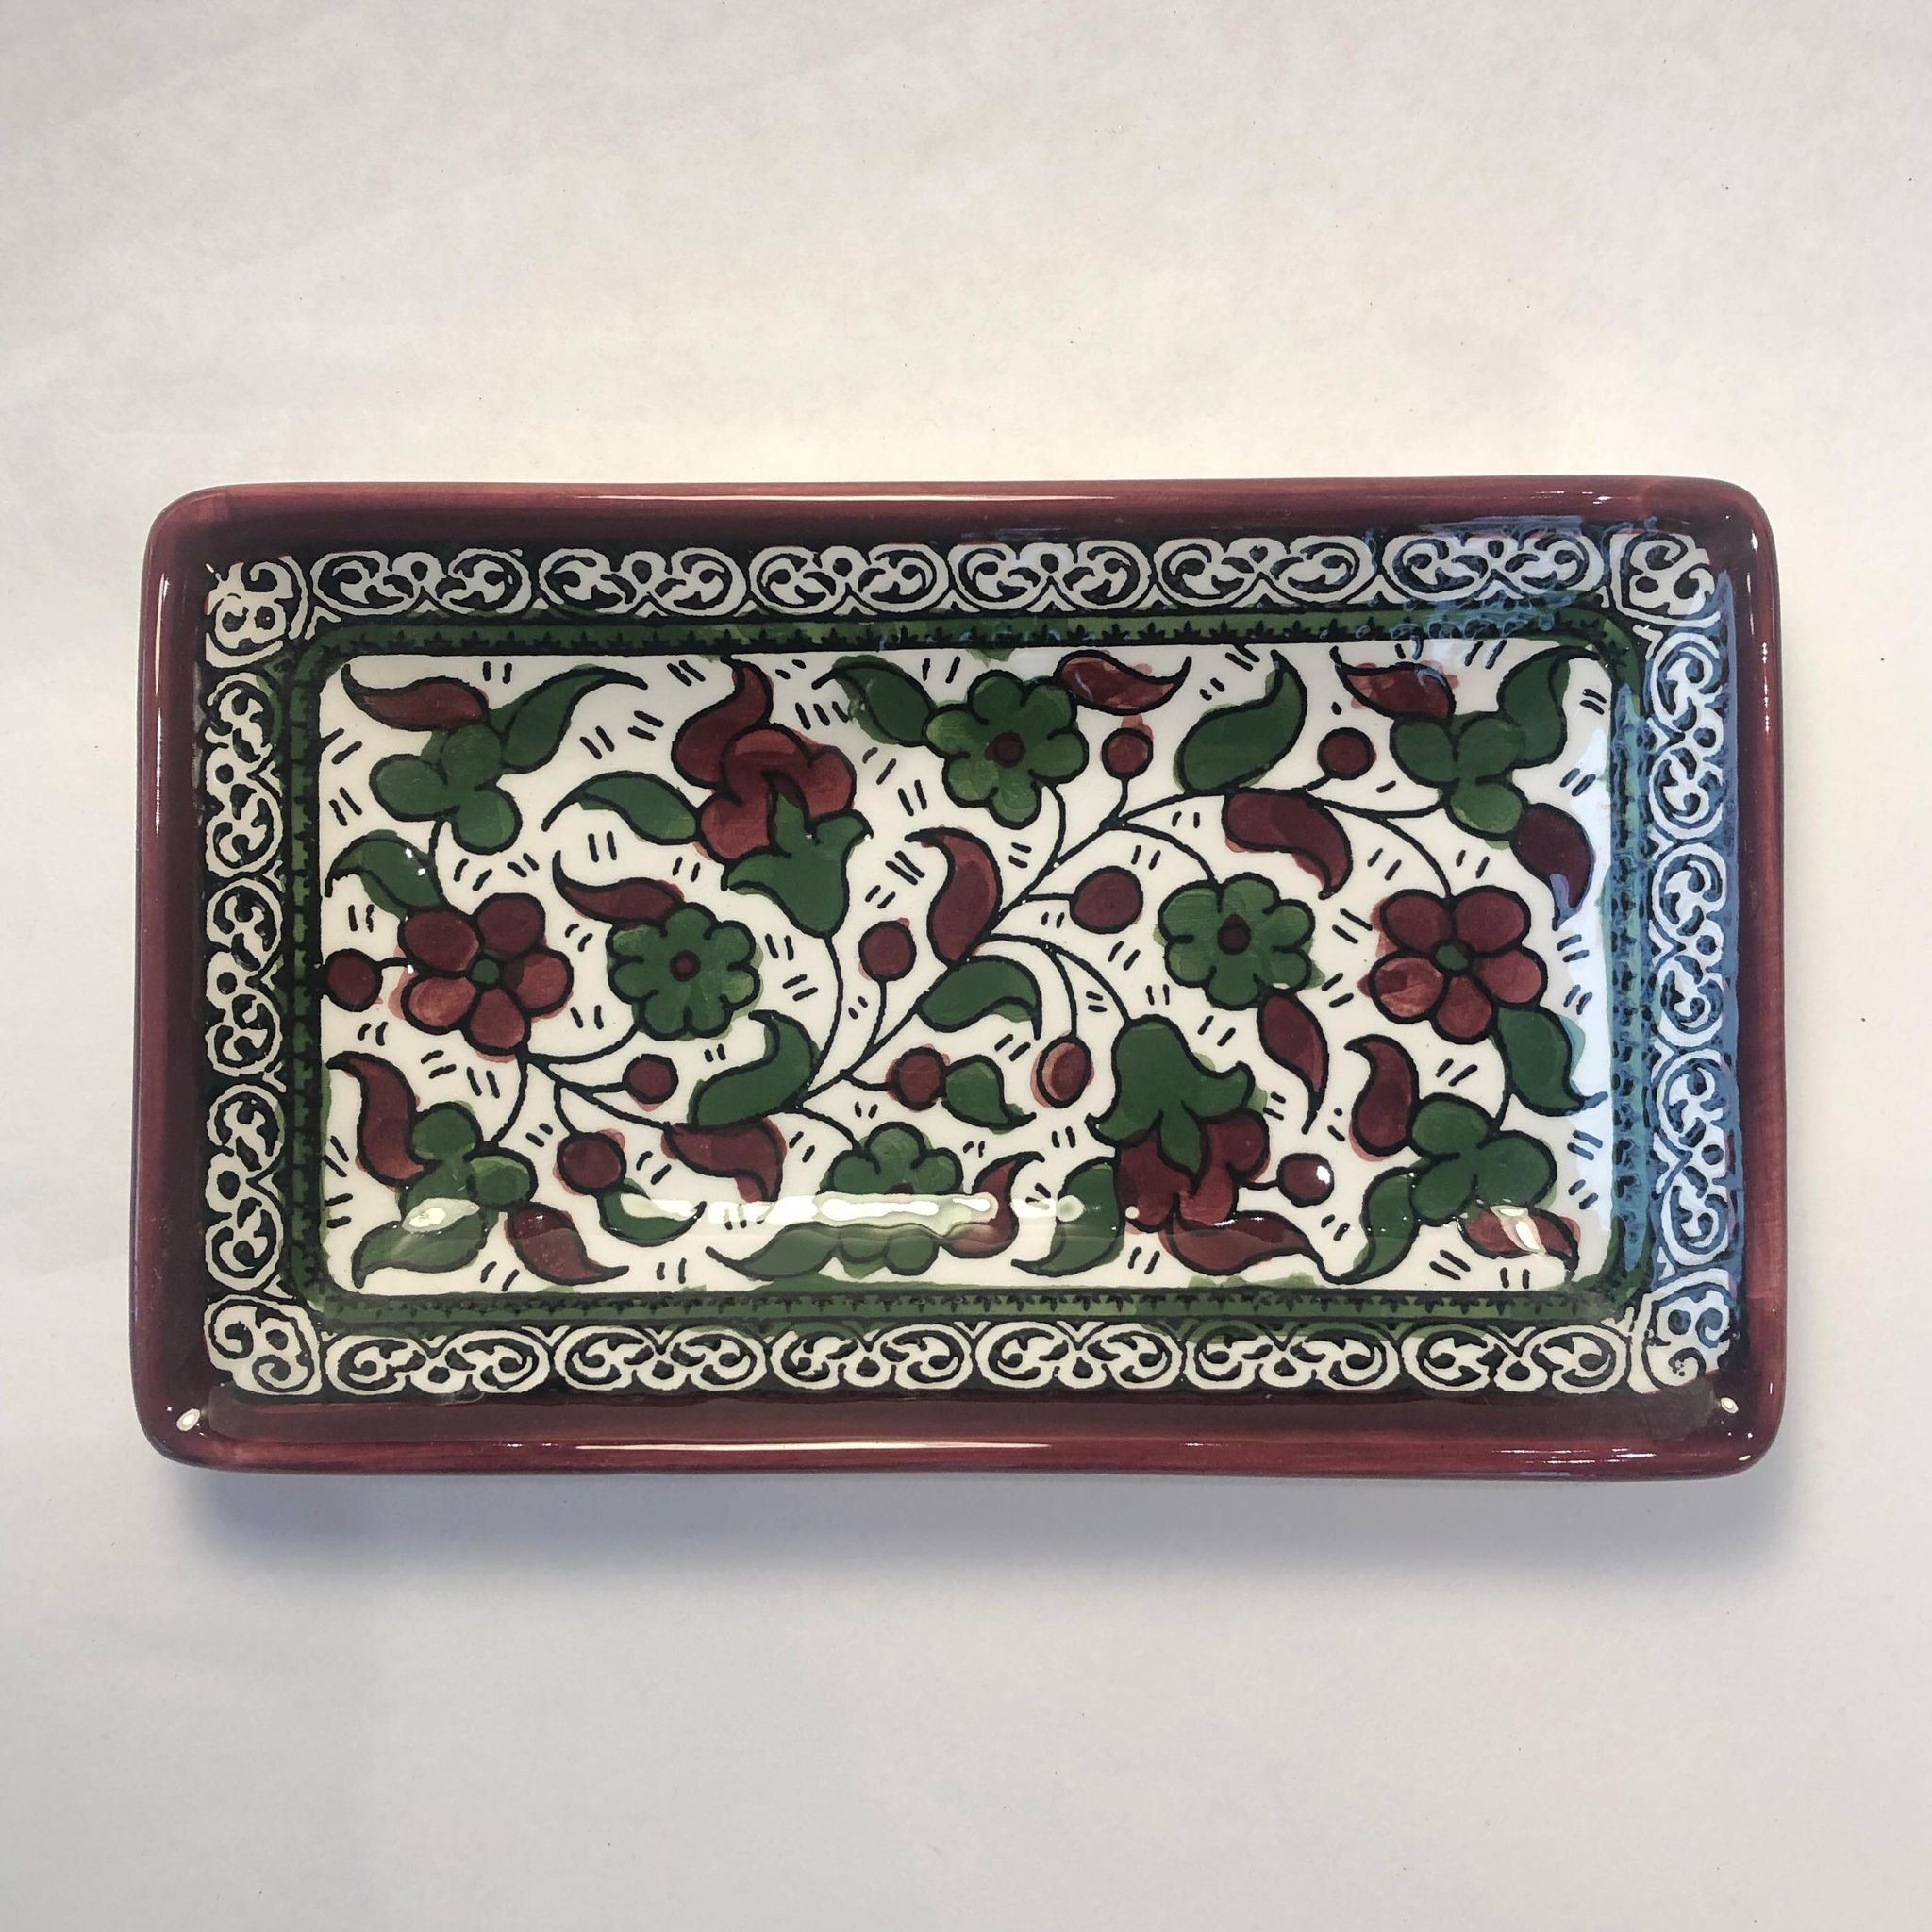 Firkantet keramikkskål, rød og grønn